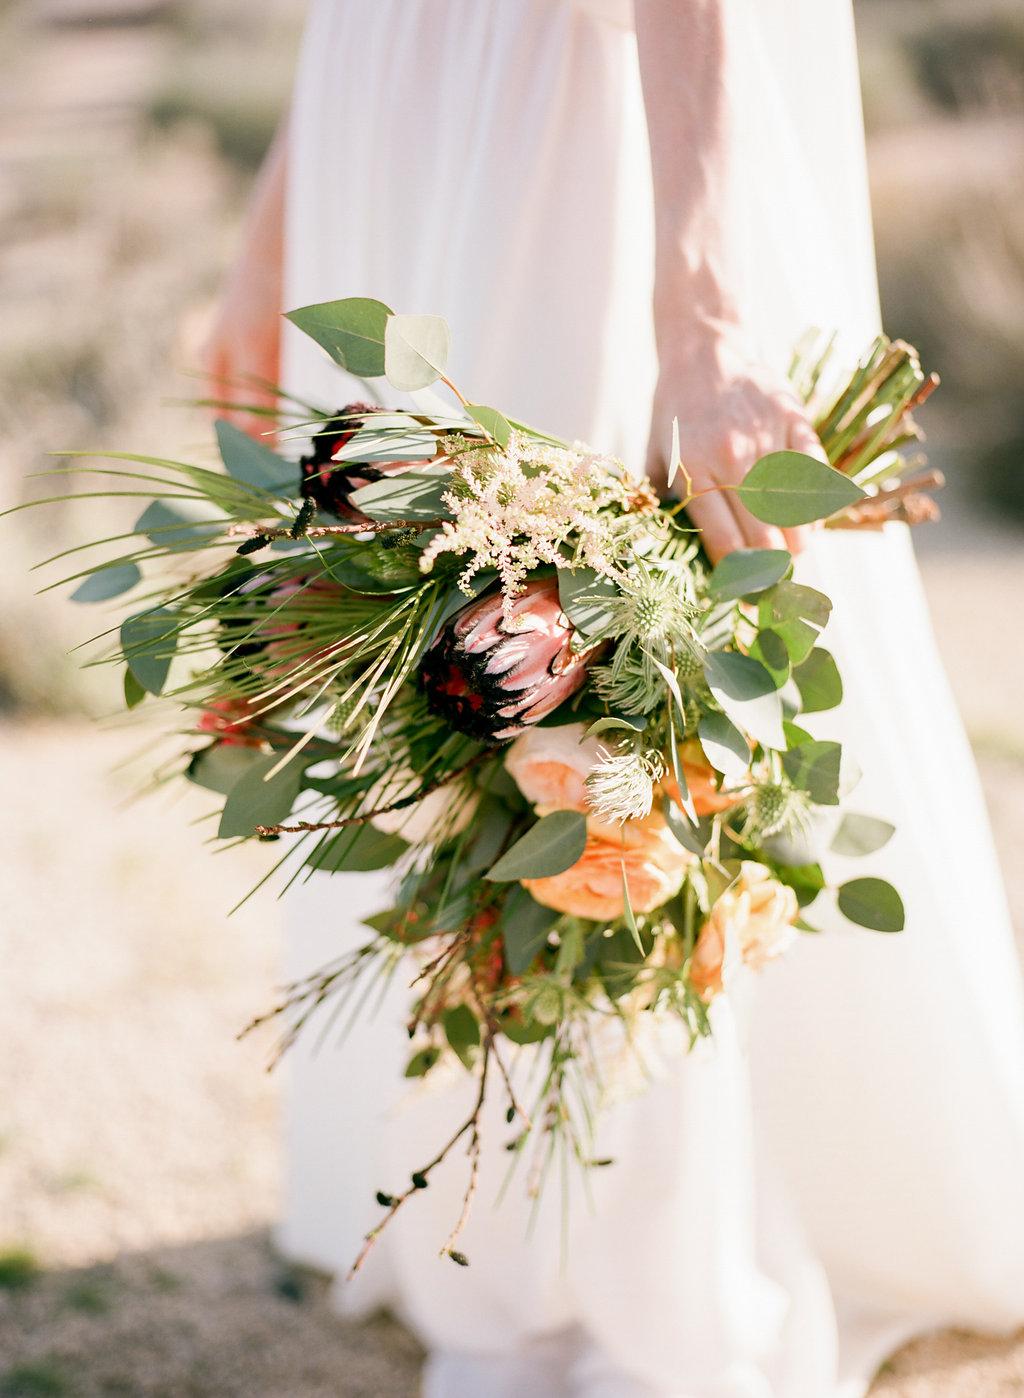 Jessica Schilling Wedding Photography bouquet